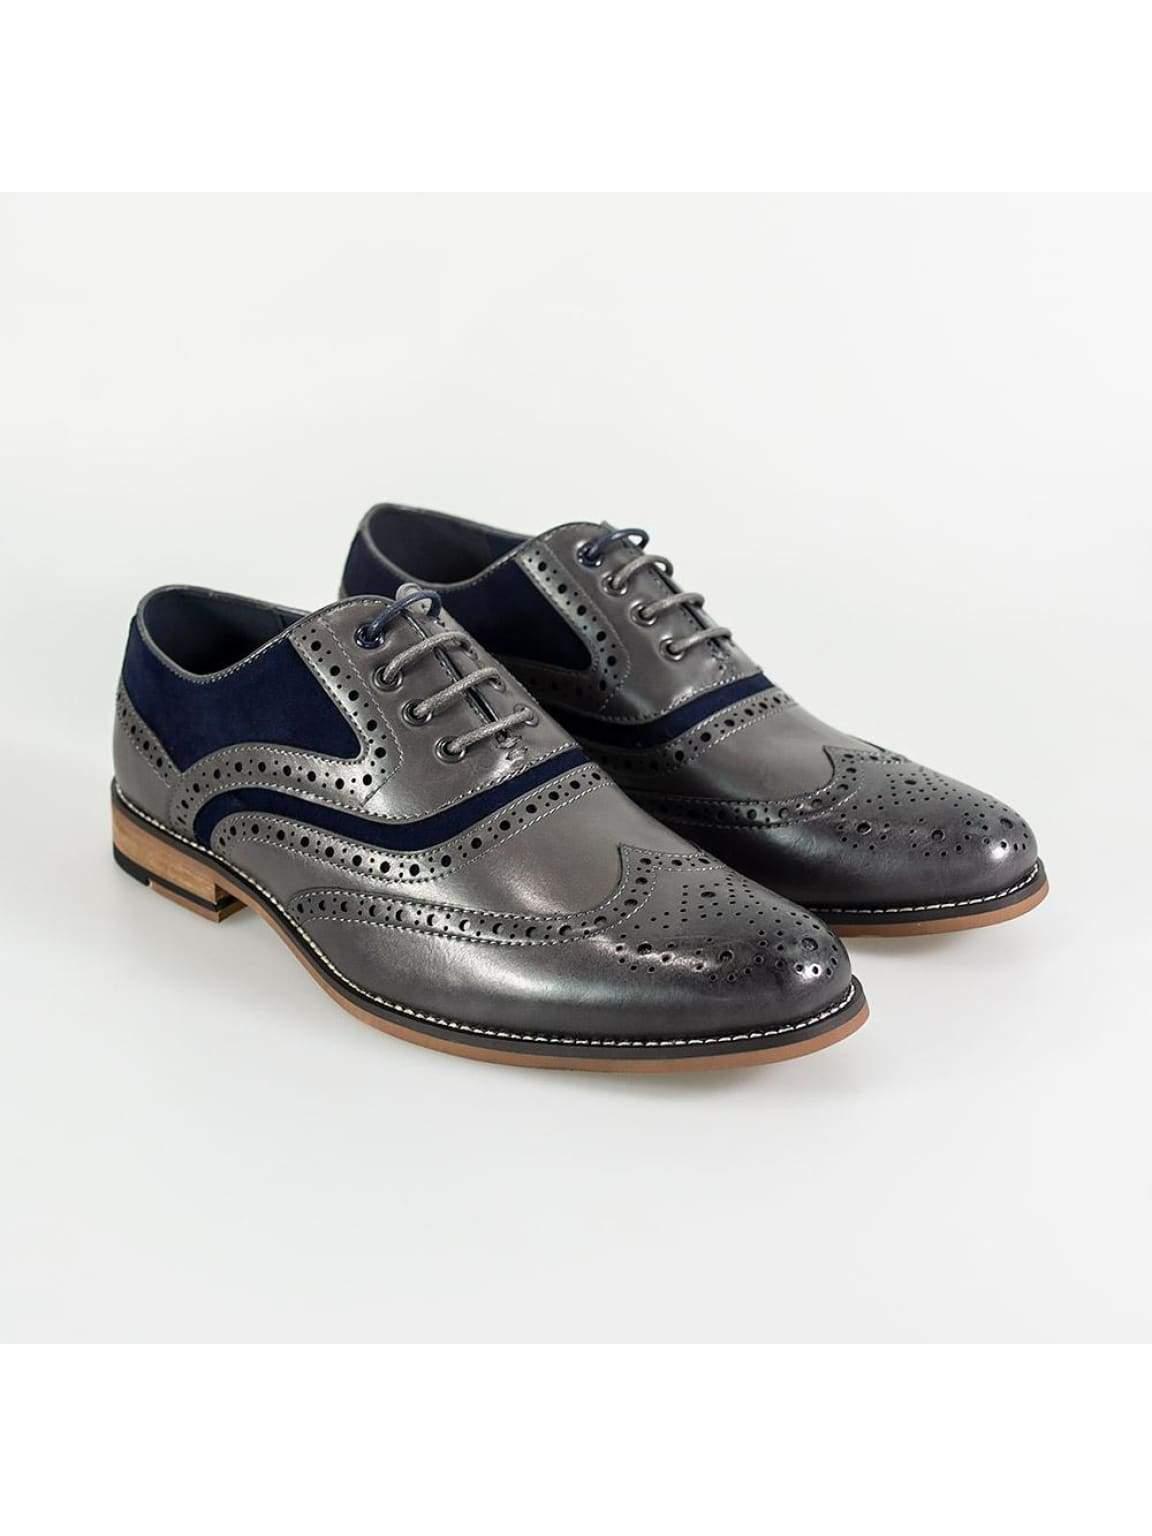 Cavani New Ethan Mens Grey/Navy Shoe - Shoes